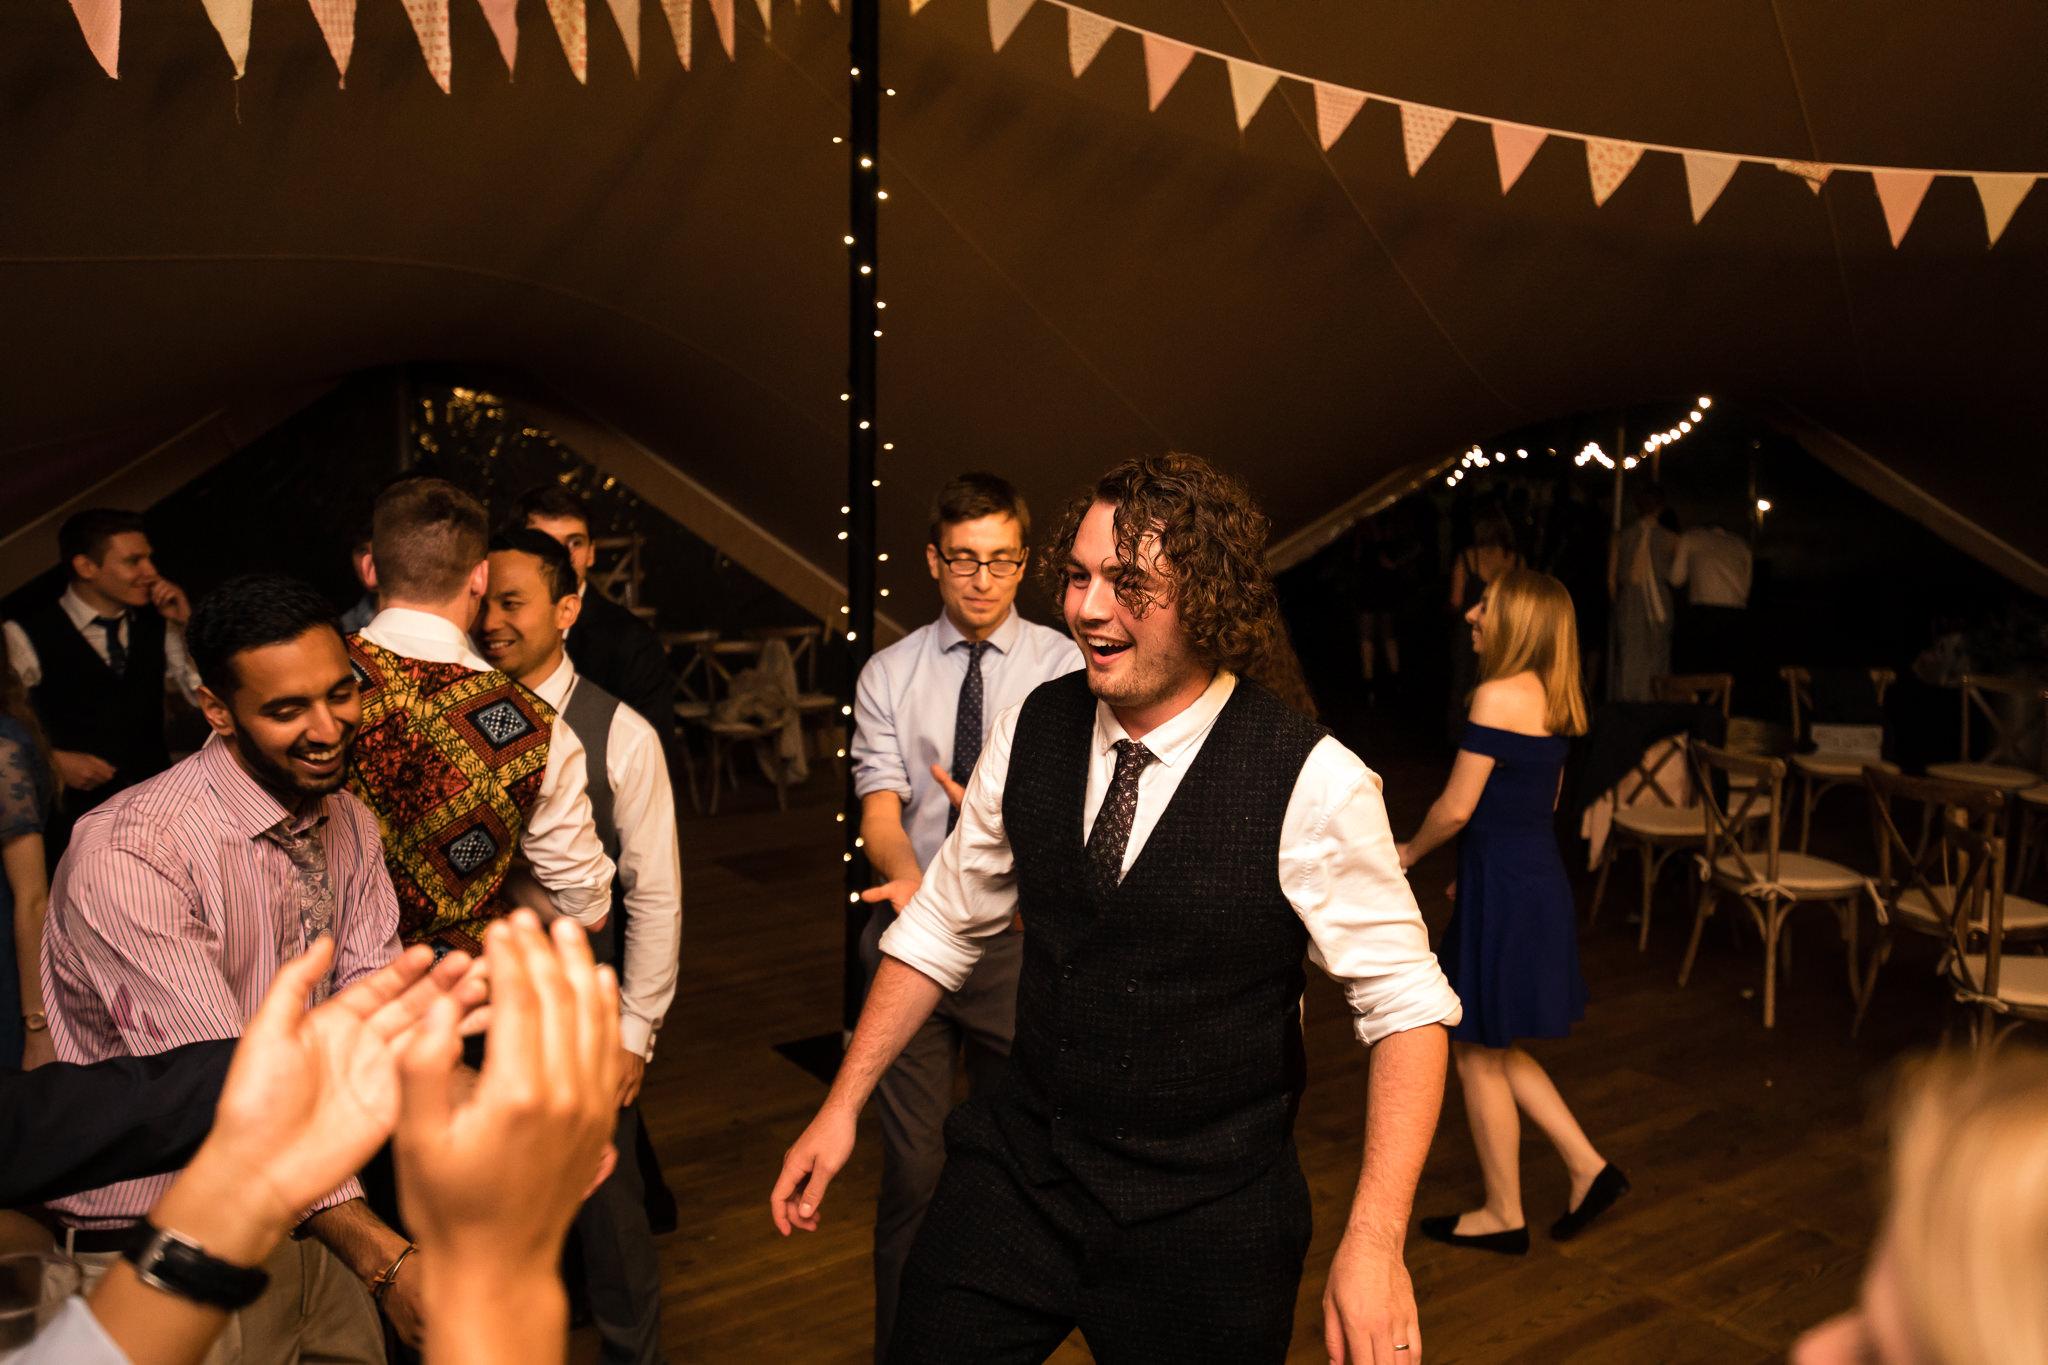 nottingham wedding85